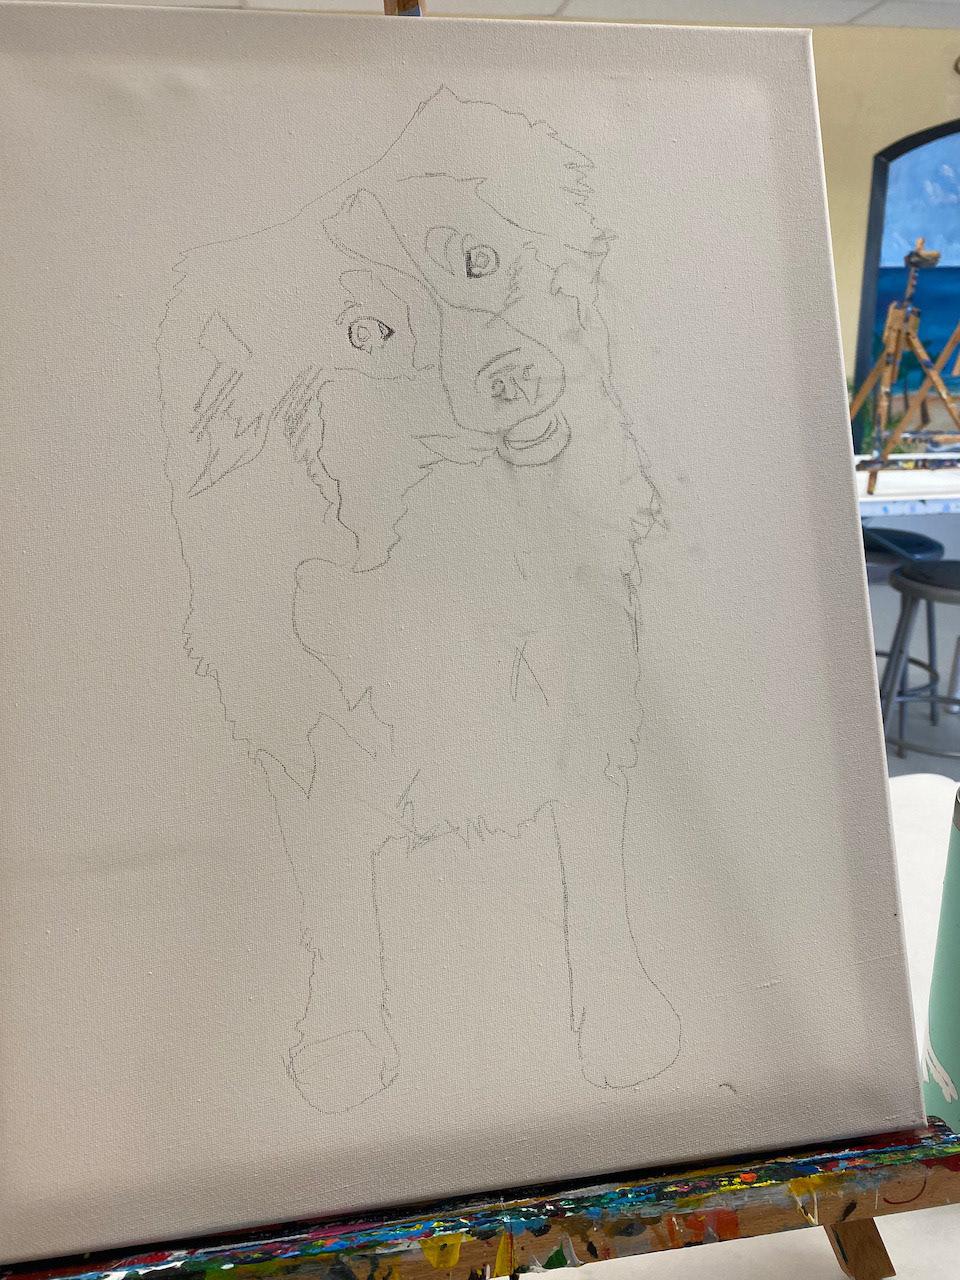 Bricole Reincke's Sketch of Red-Tri Mini Aussie